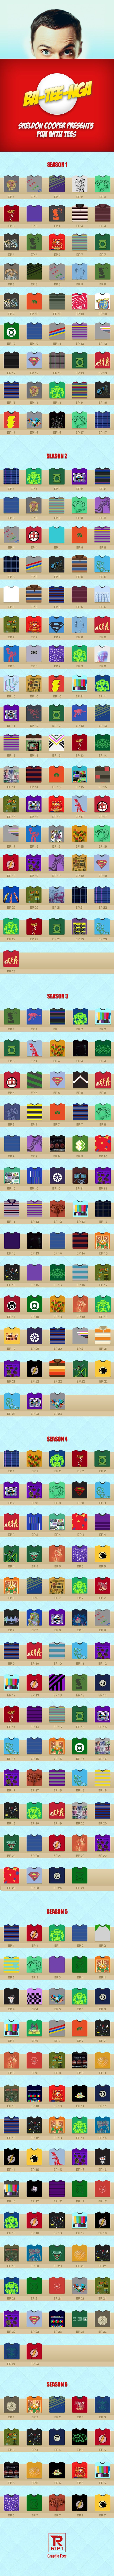 Every T-Shirt Sheldon Has Worn